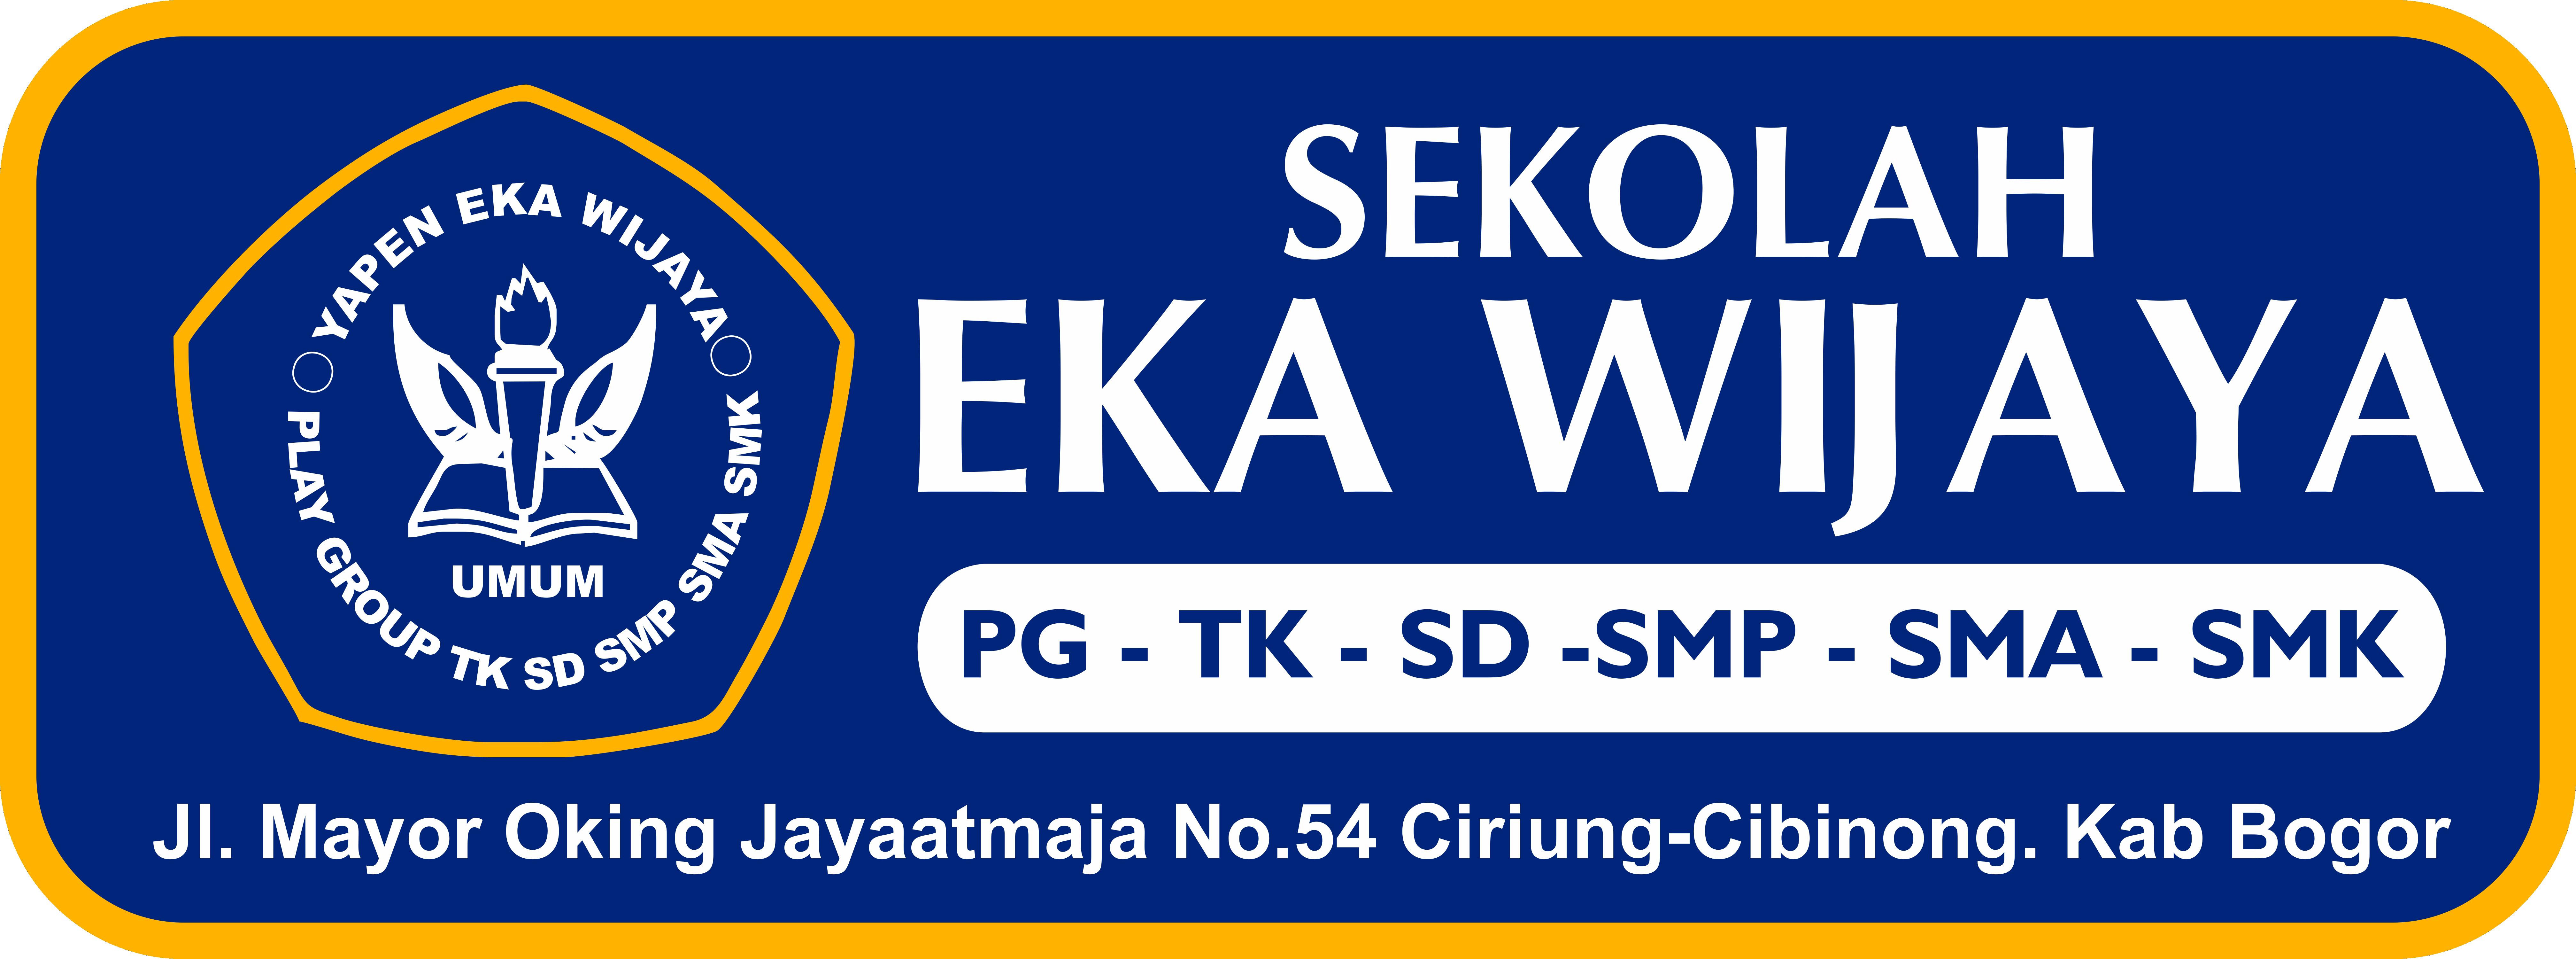 Sekolah Eka Wijaya